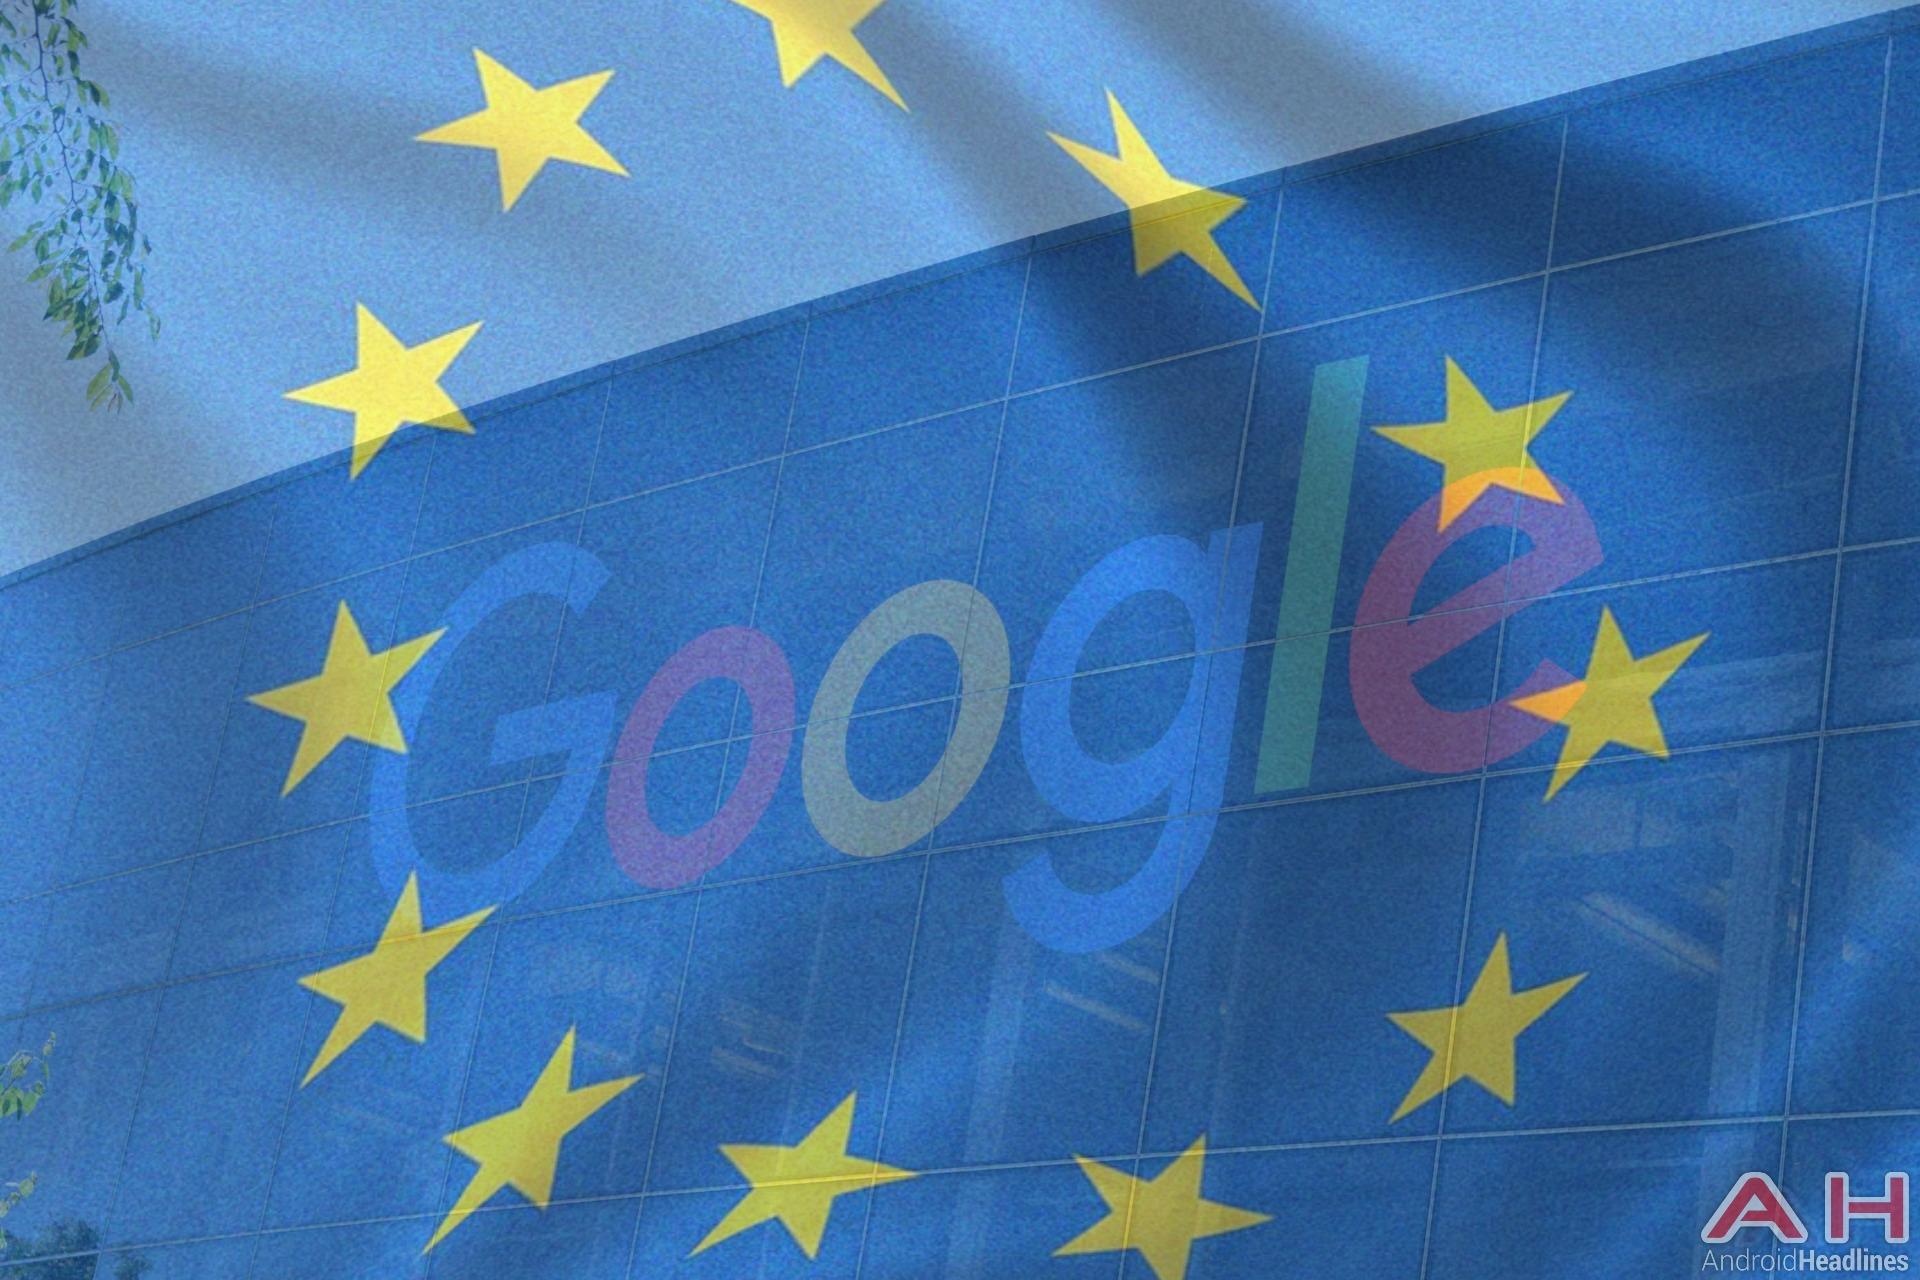 Trump Defends Google, Blasts EU Over Android Antitrust Fine